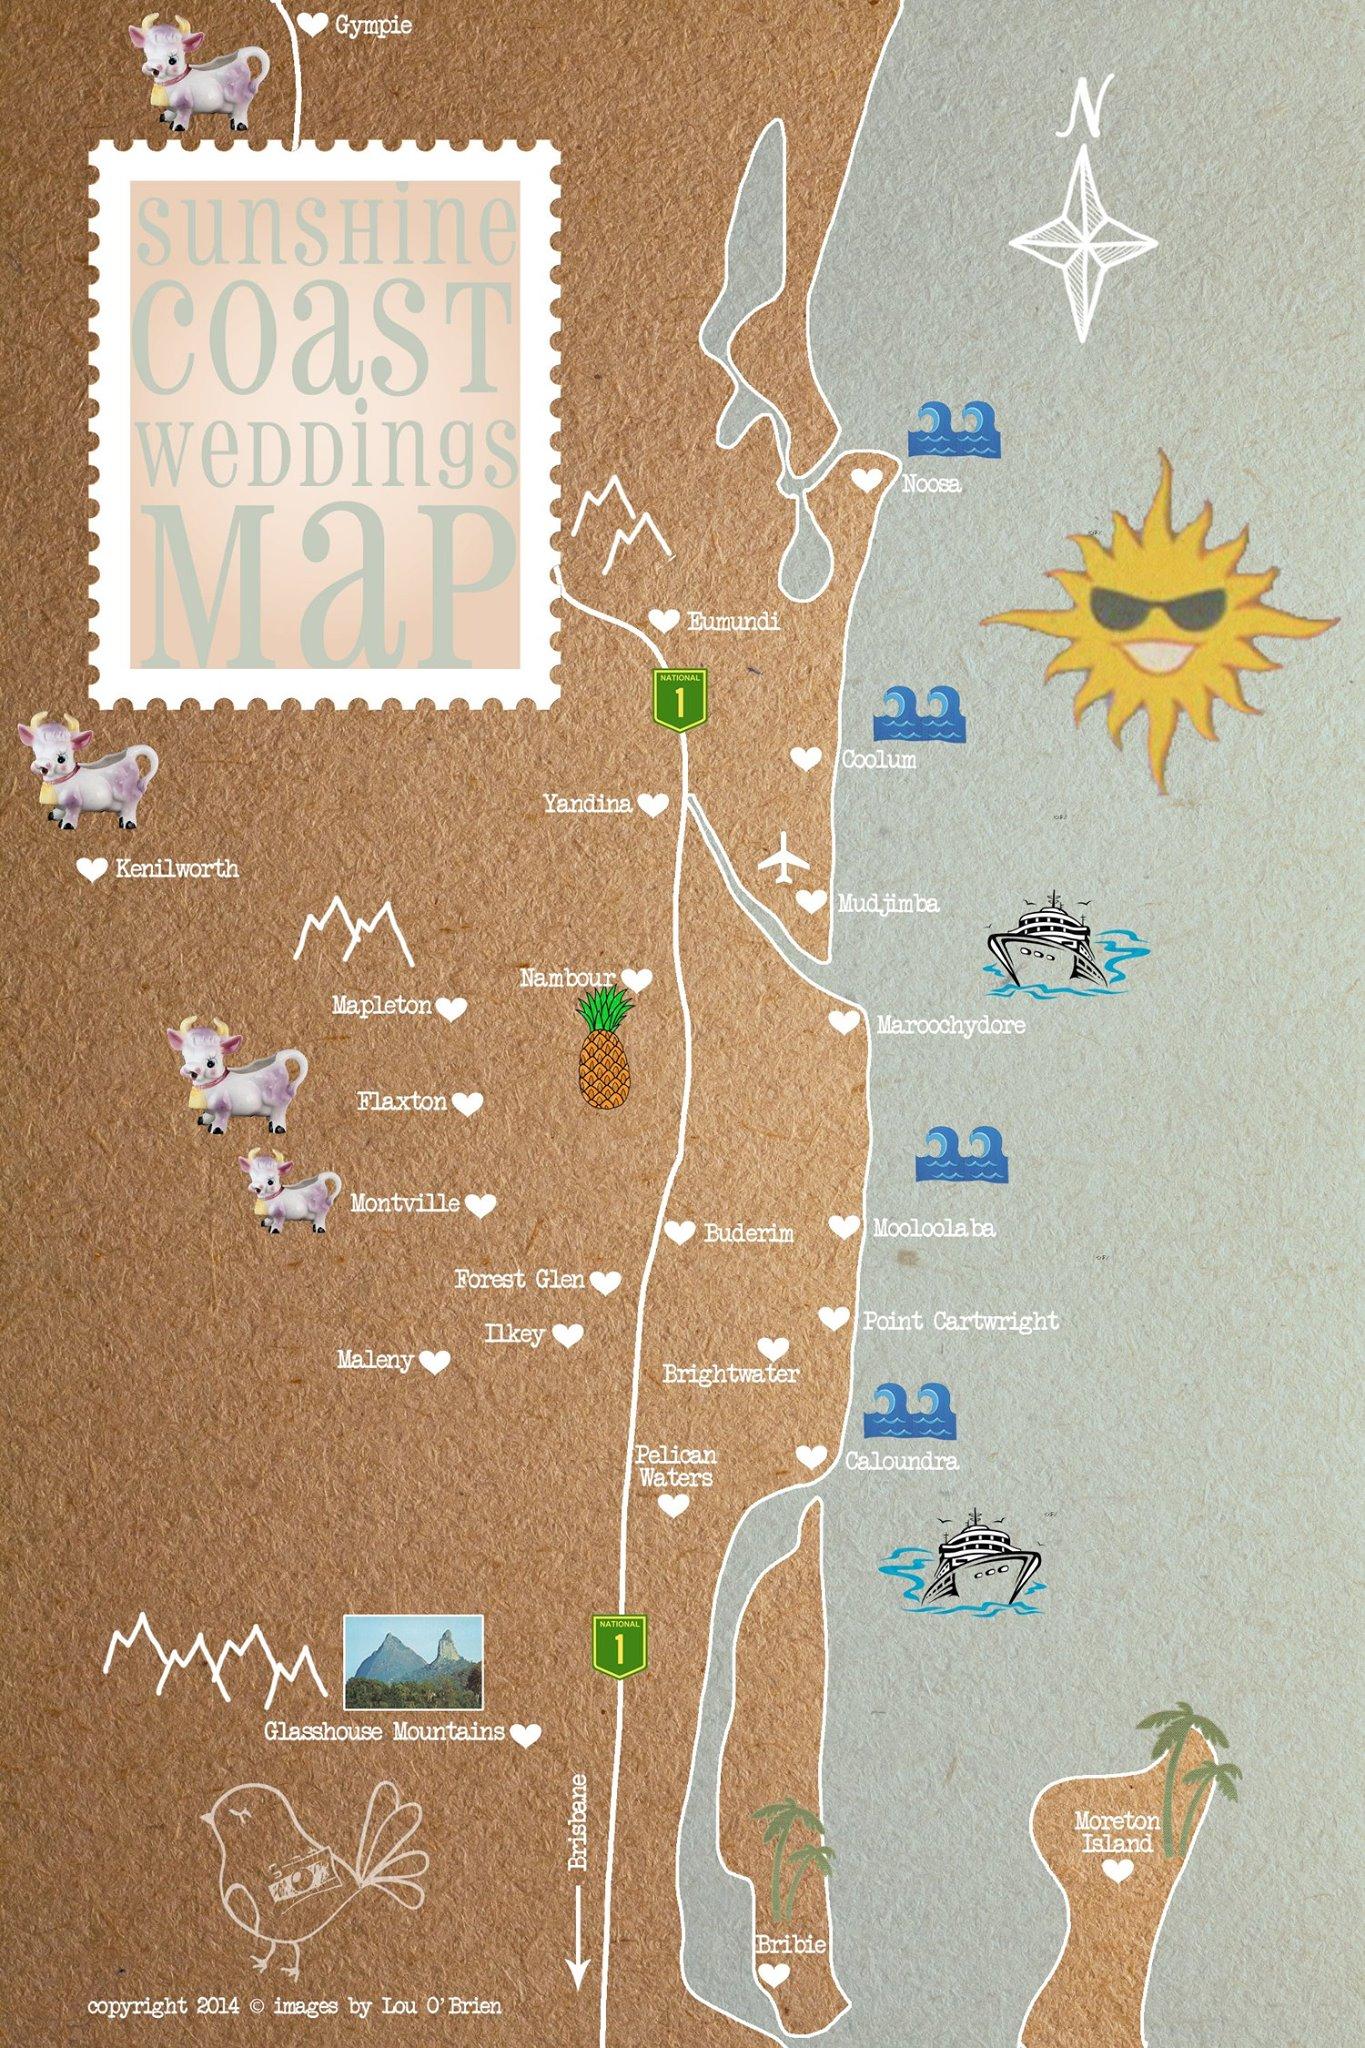 Images By Lou O'Brien Wedding Map- Plan My Wedding Sunshine Coast